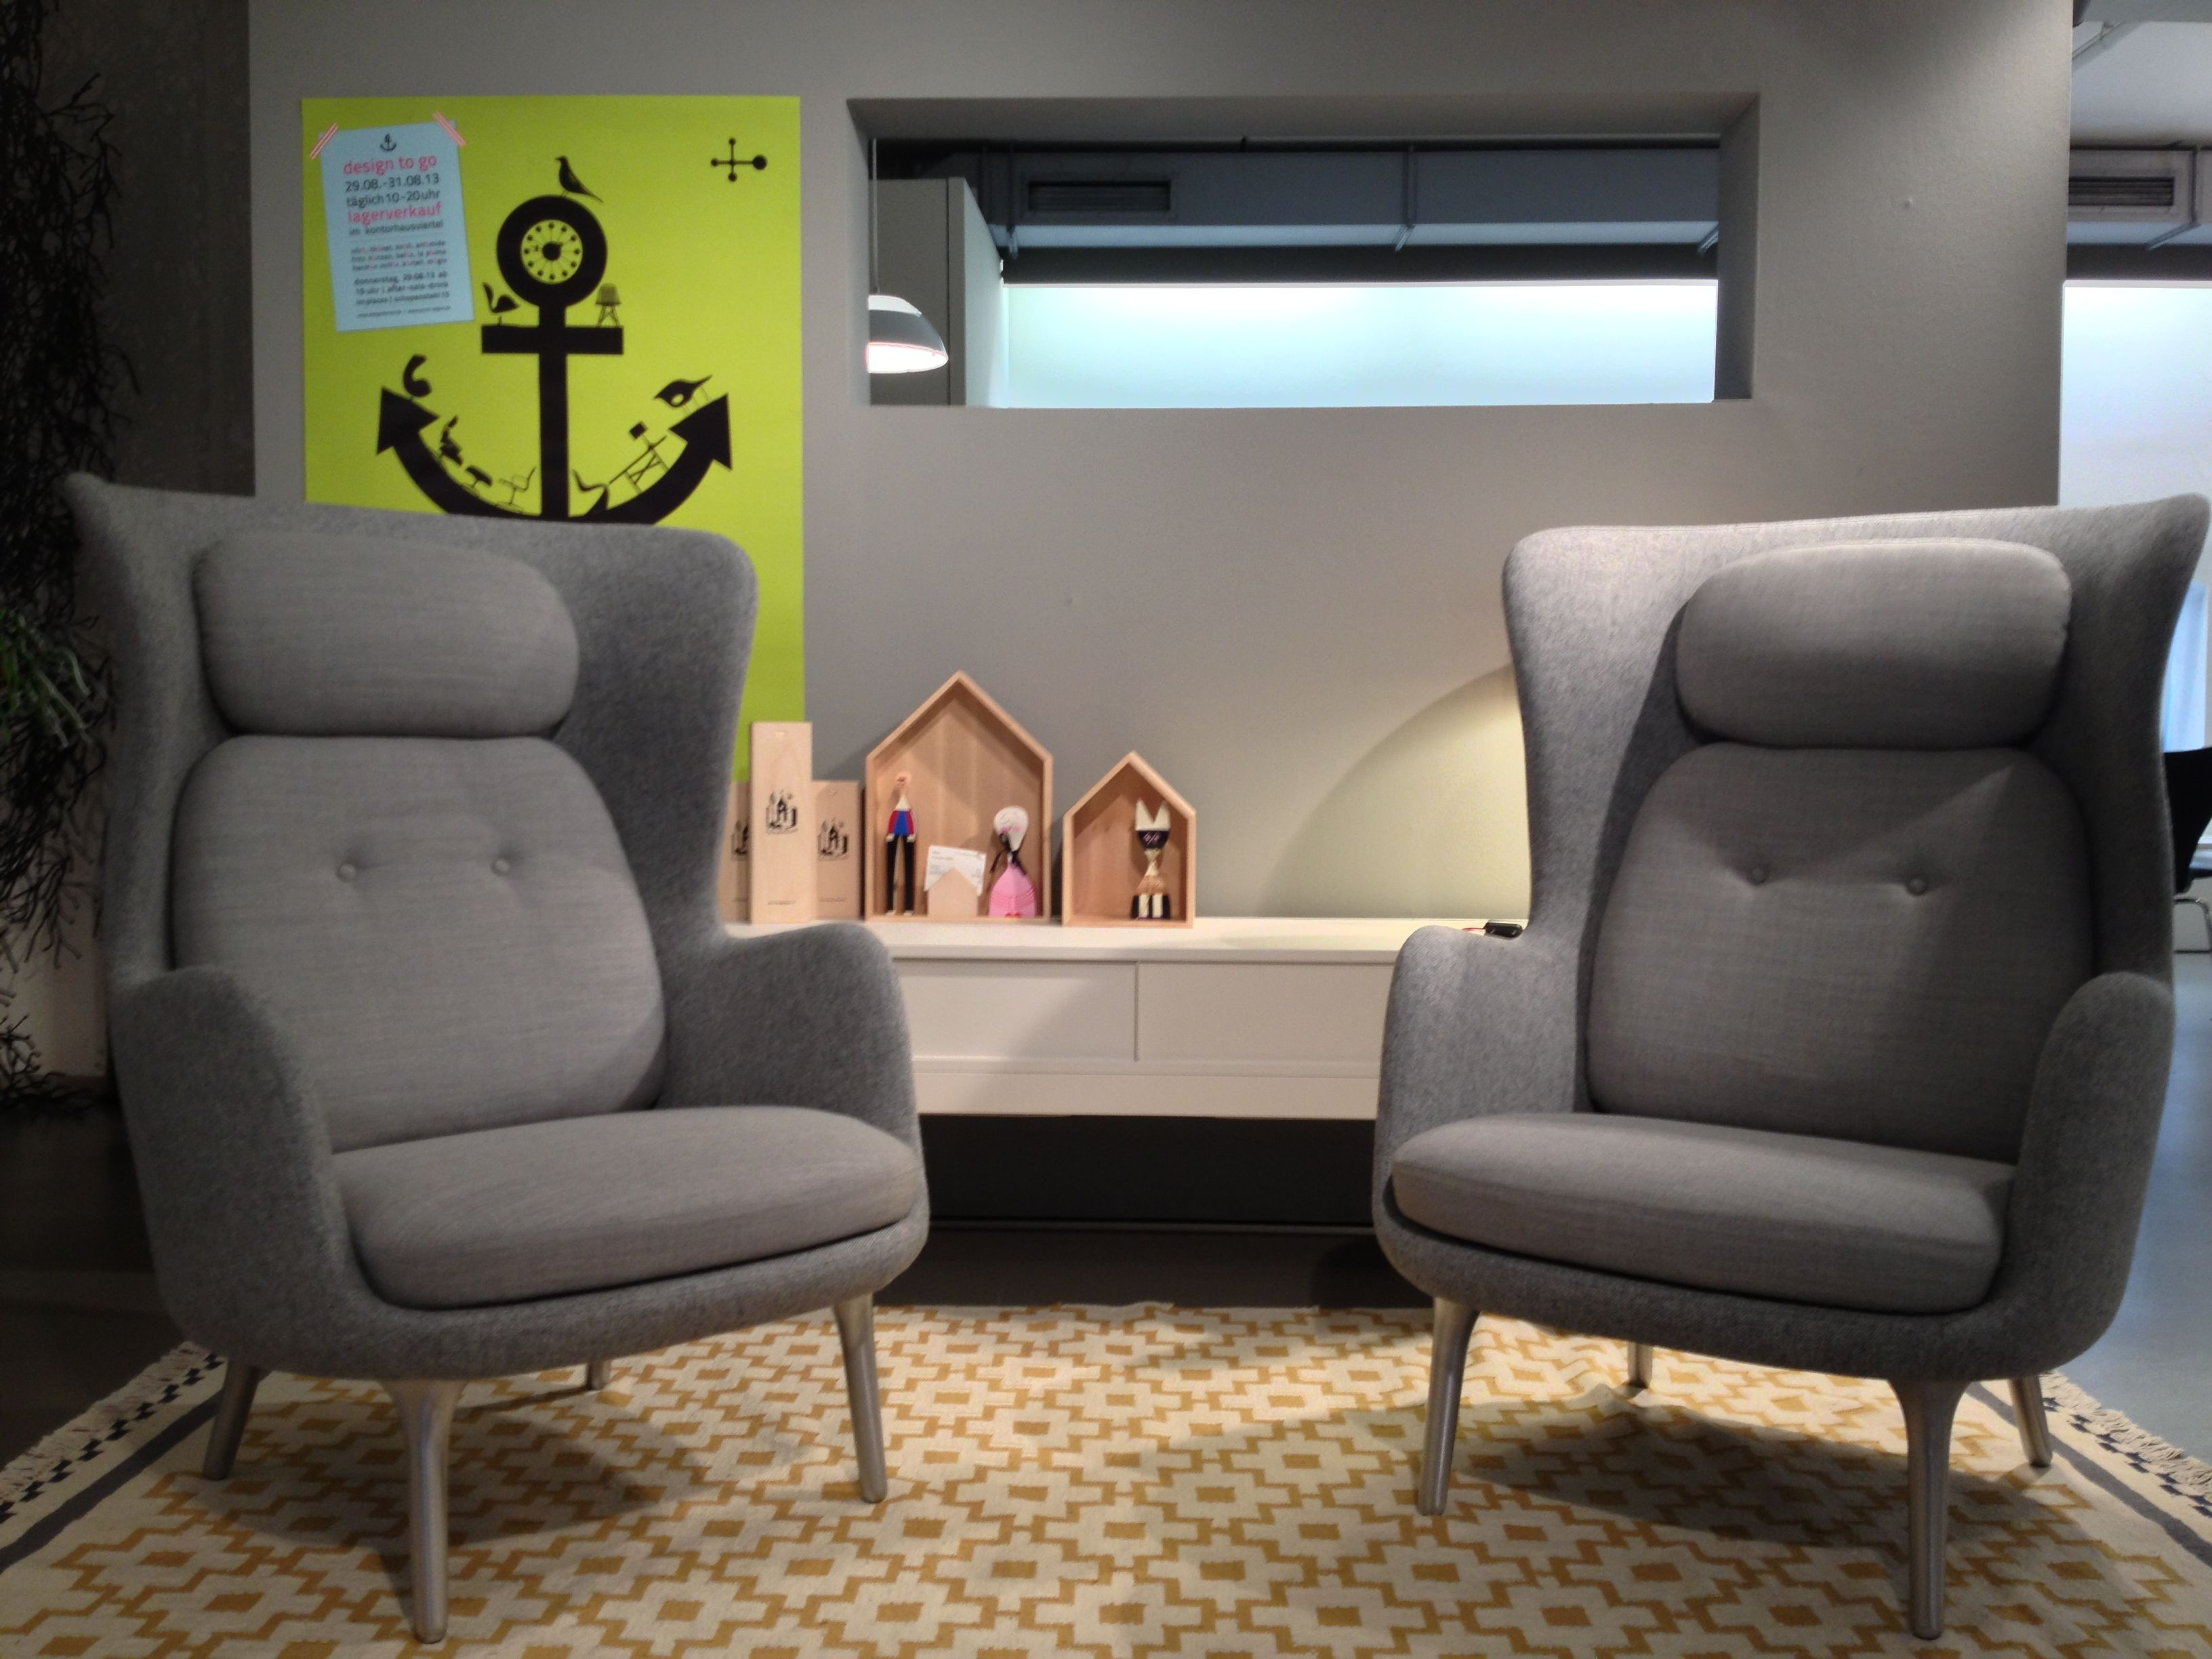 fritz hansen ro sessel showroom stilwerk hamburg fischmarkt pinterest fritz hansen. Black Bedroom Furniture Sets. Home Design Ideas